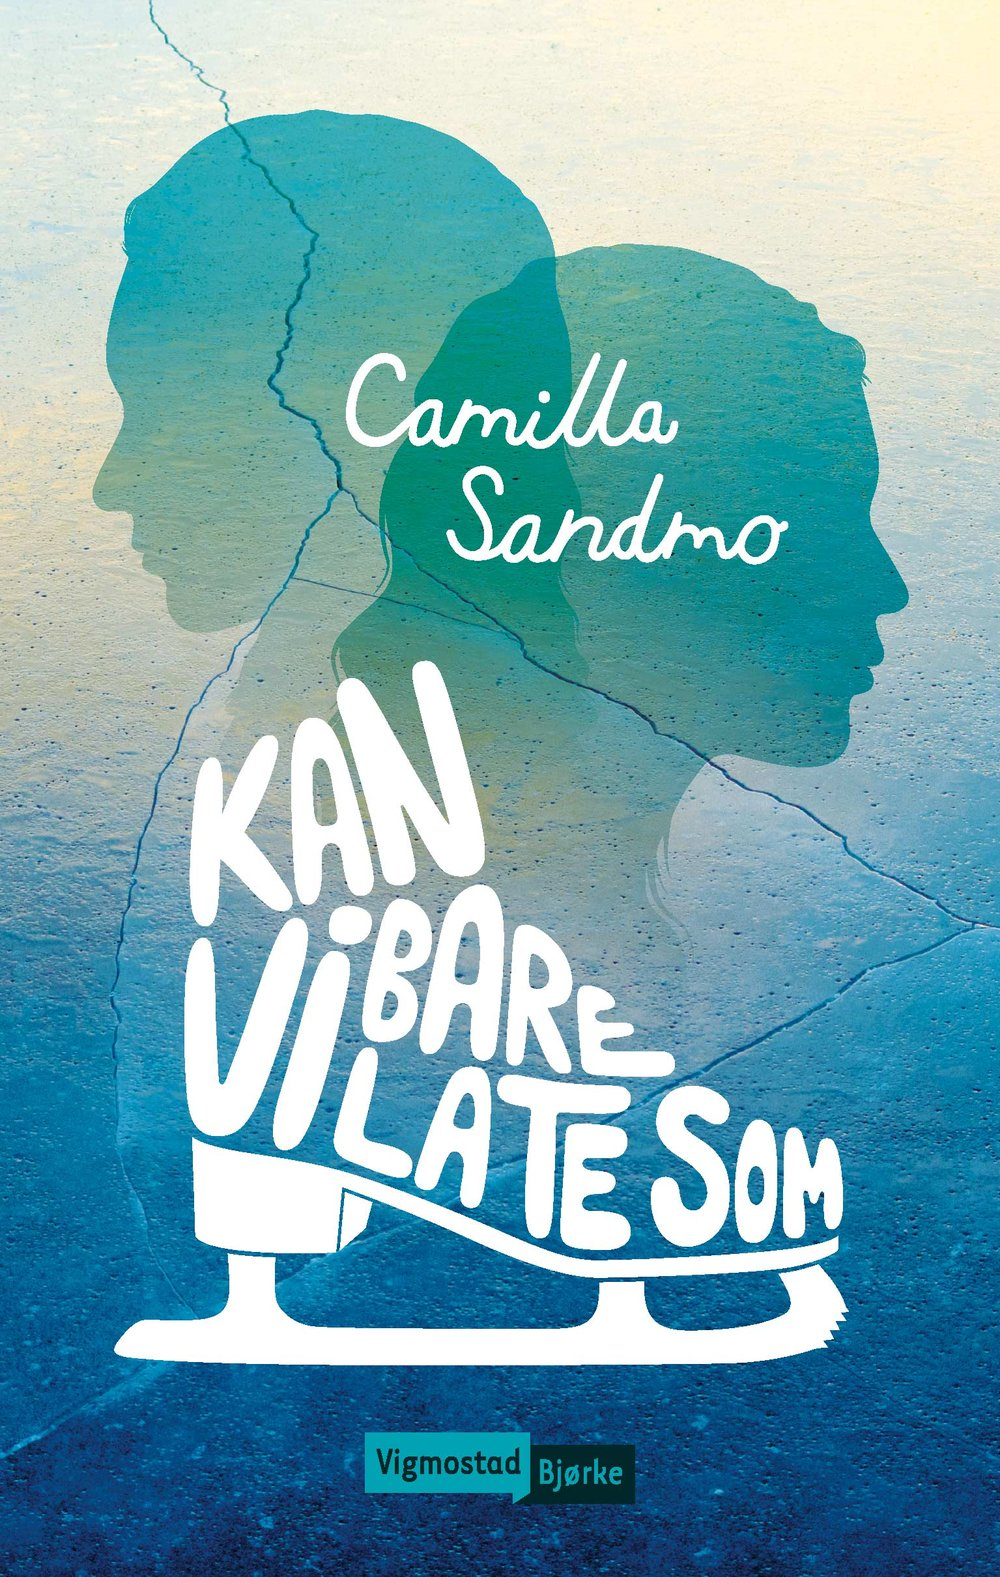 Camilla_Sandmo_2.jpg